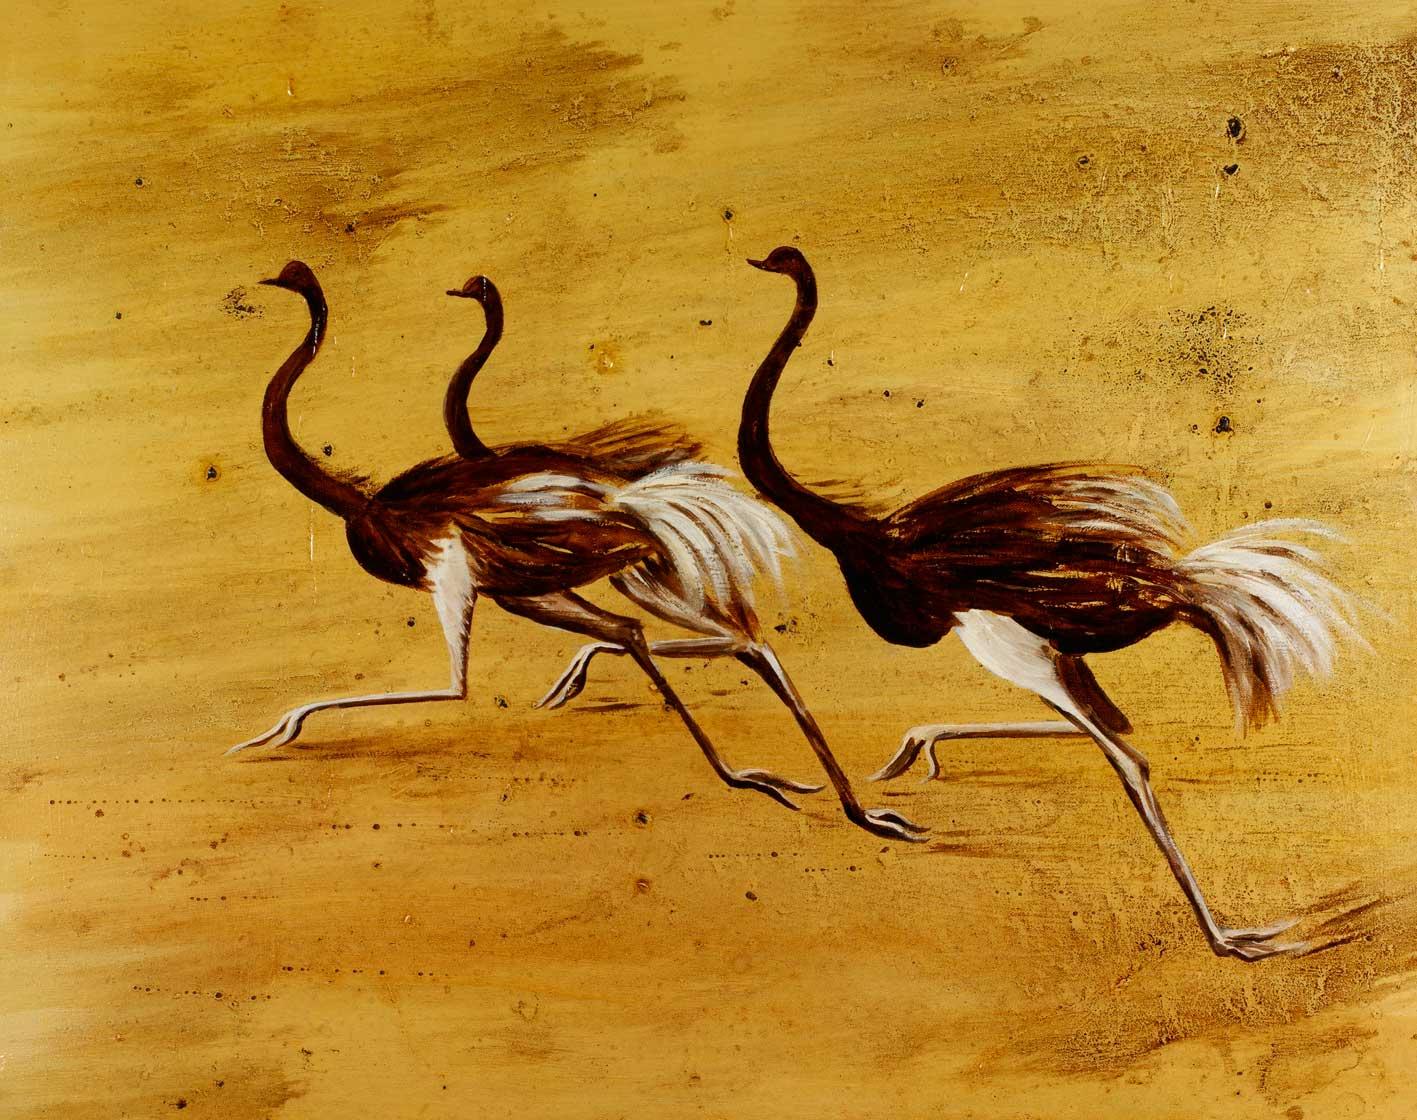 Full Pelt, 25x30 inches, by Sarah Elder, award-winning wildlife artist